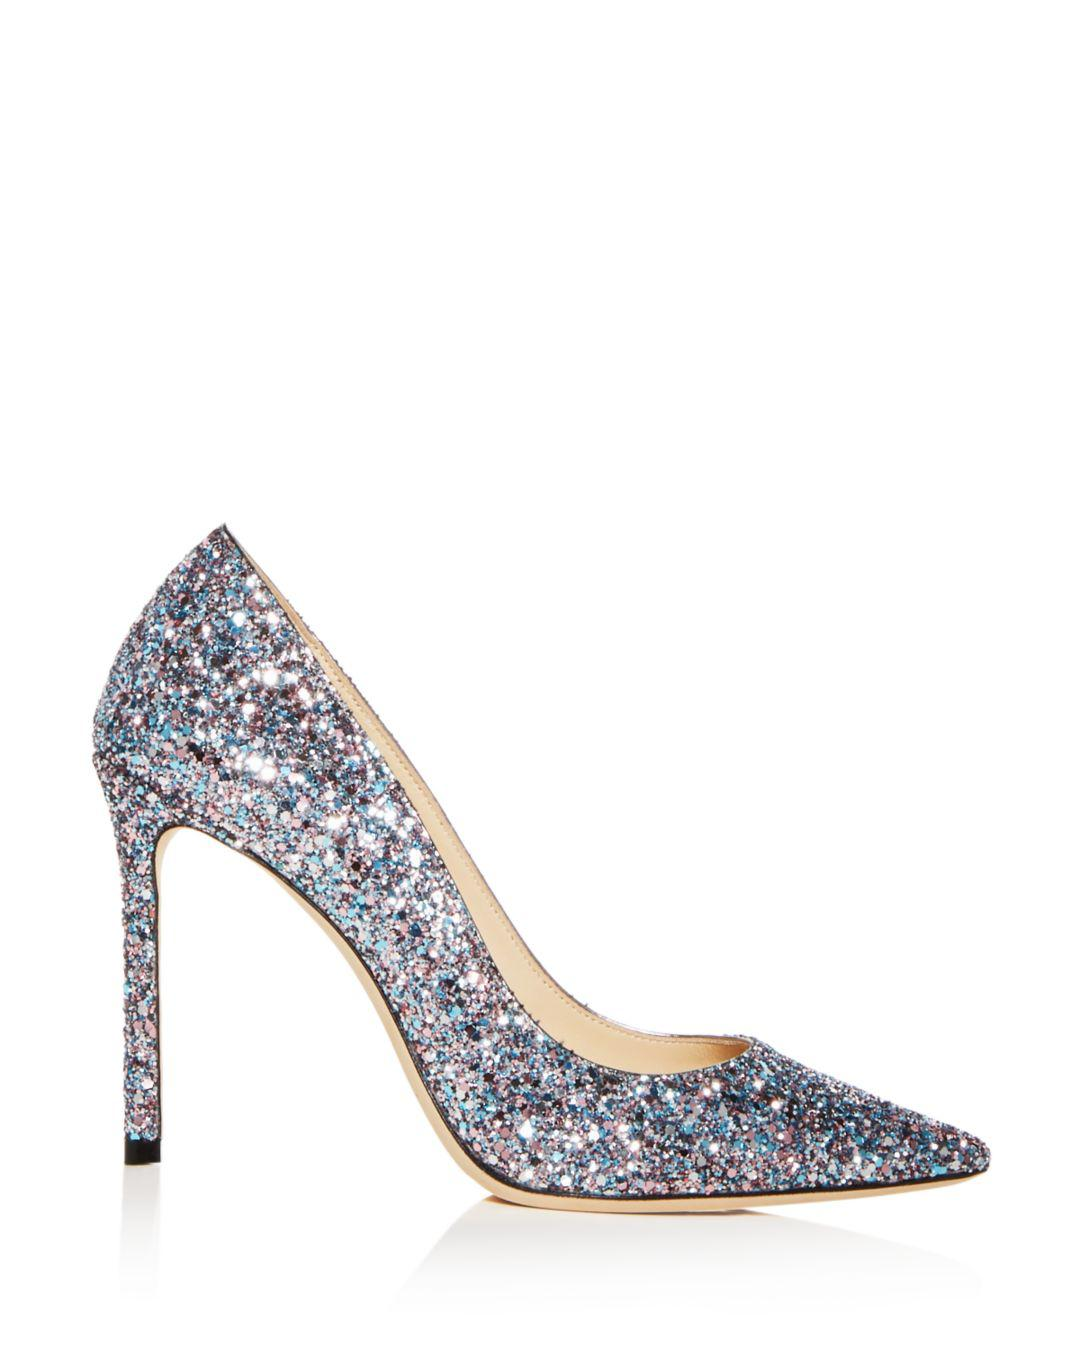 558439065d85 Jimmy Choo Women s Romy 100 Glitter Pointed-toe Pumps - Save  7.88091068301226% - Lyst